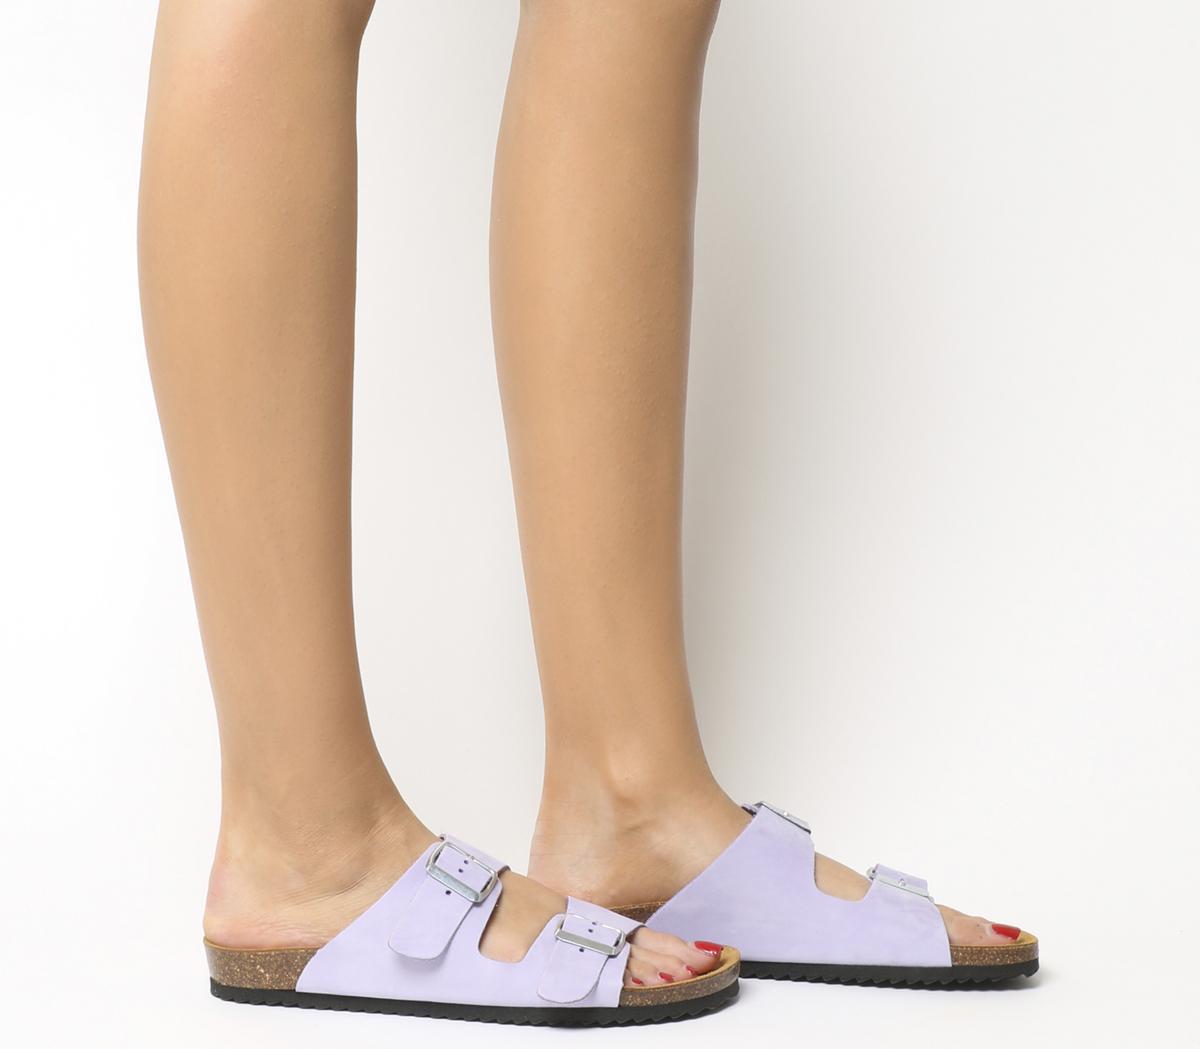 Hype 2 Double Strap Sandals